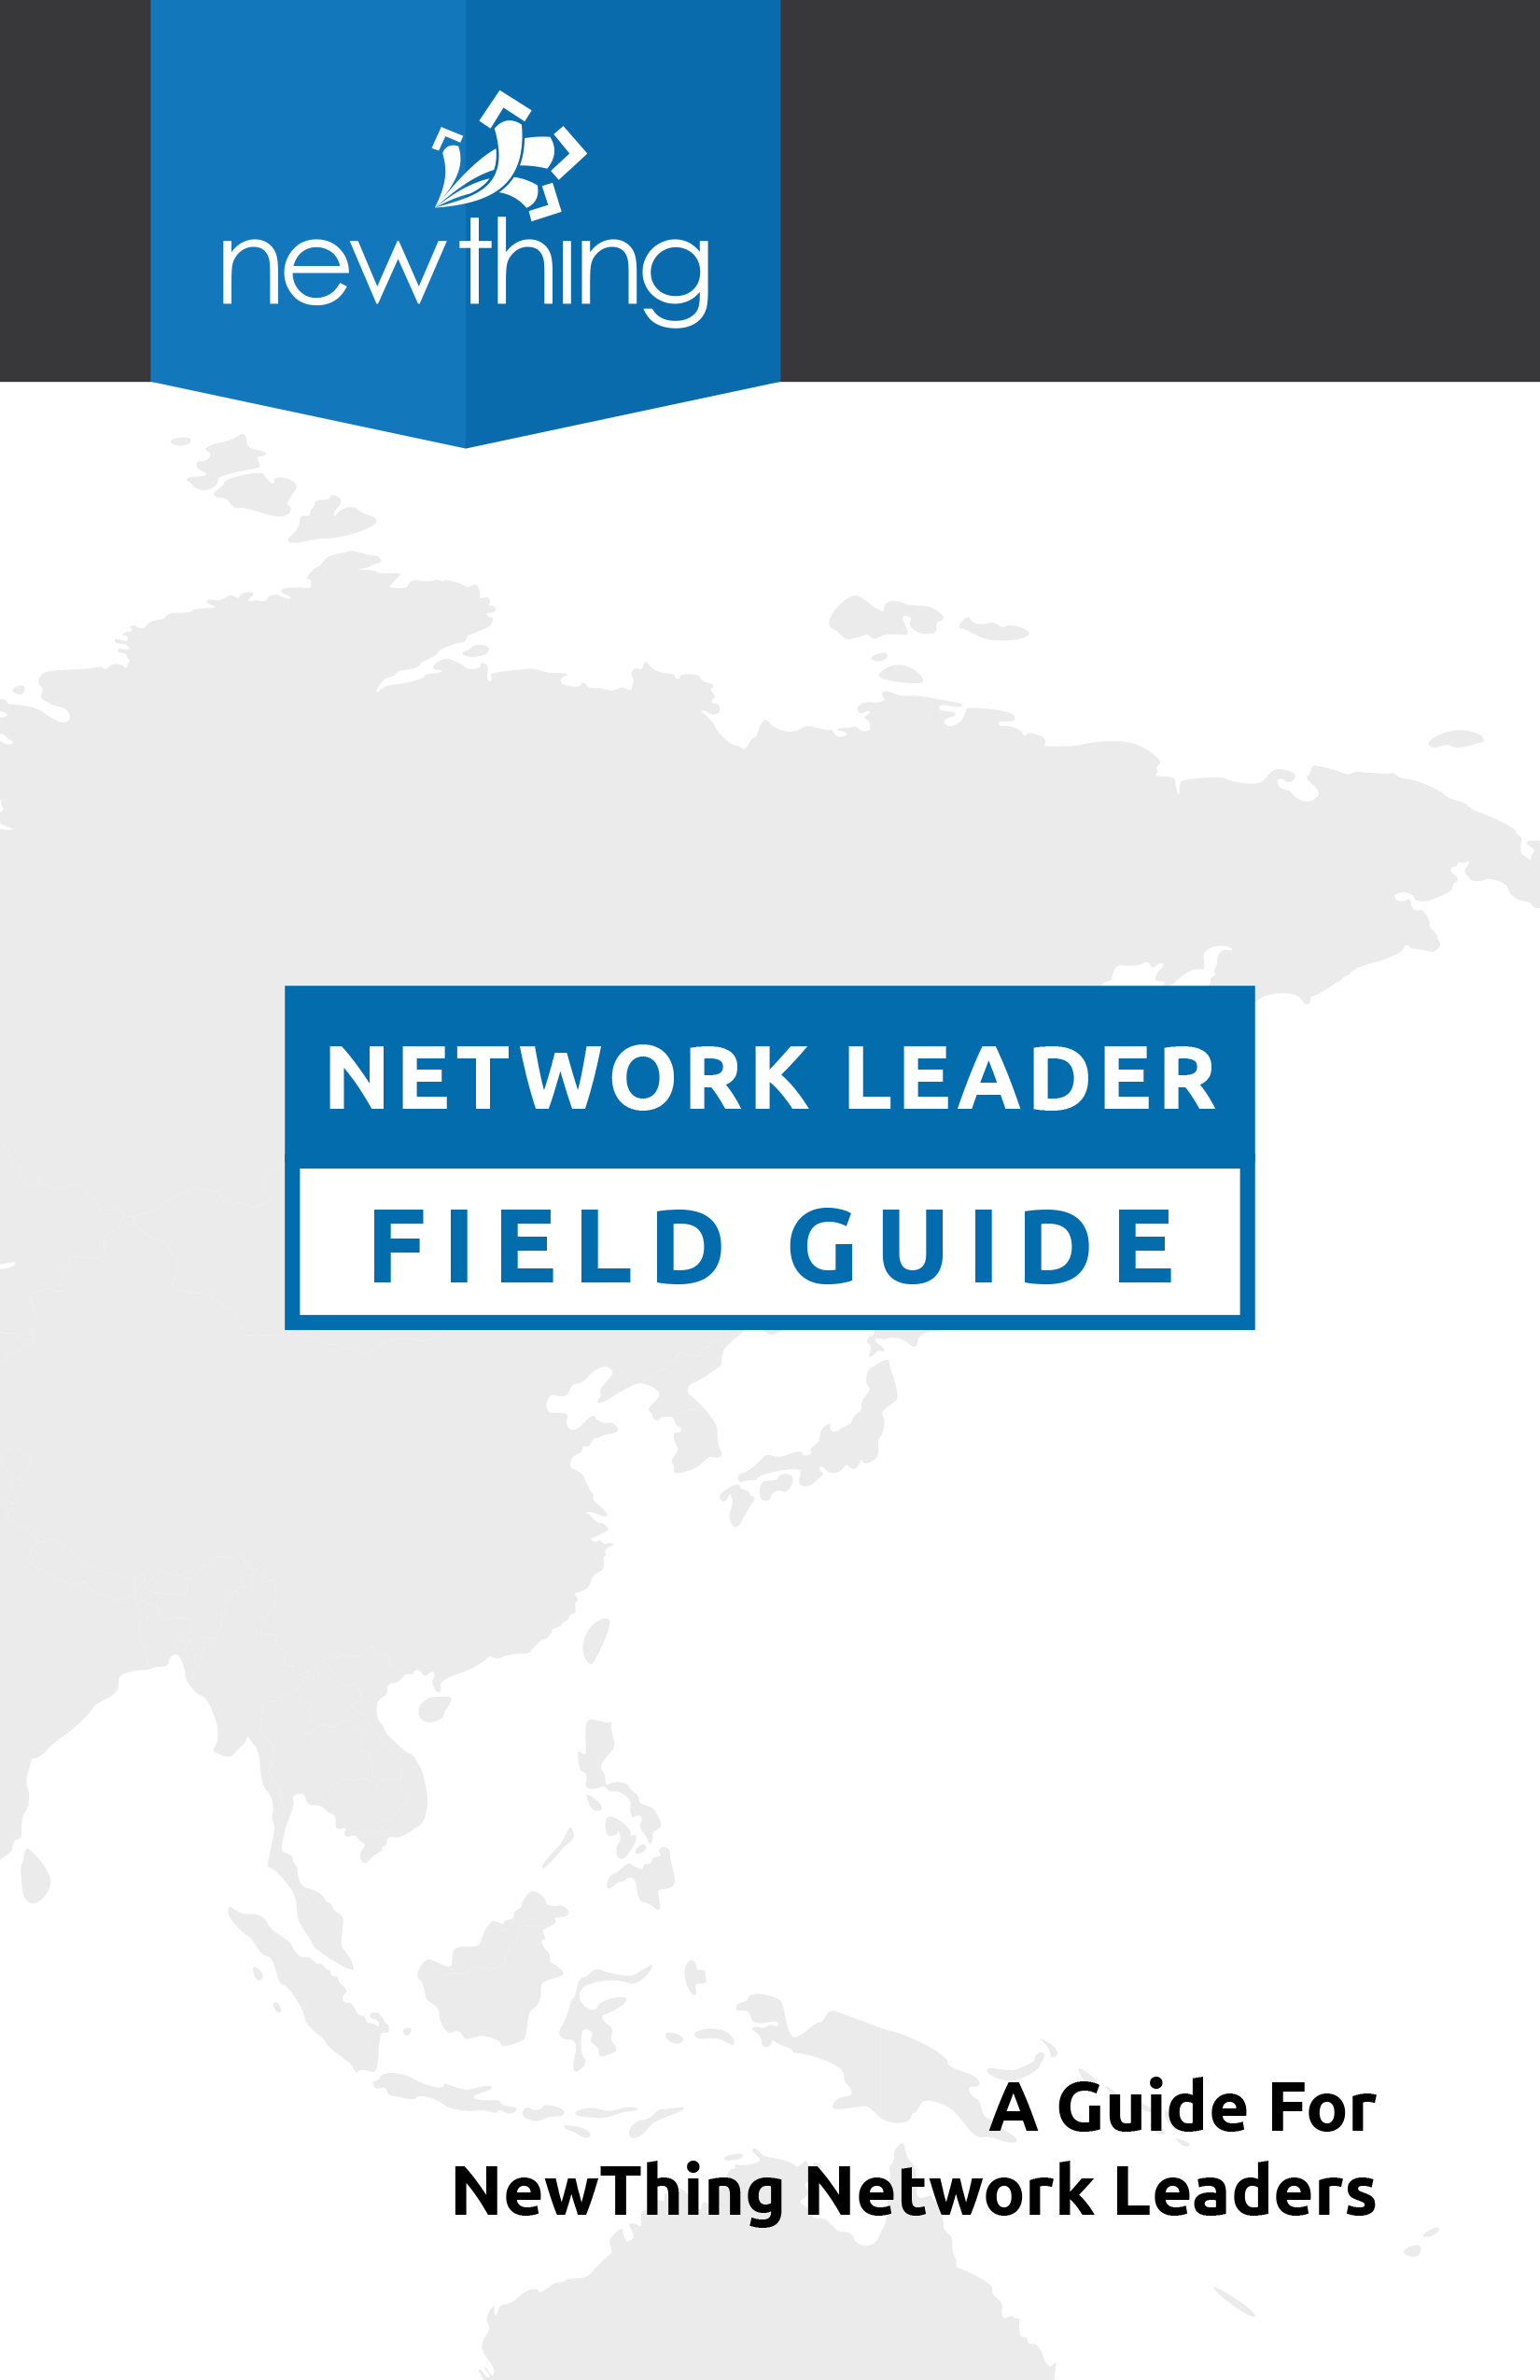 Network Leader Field Guide